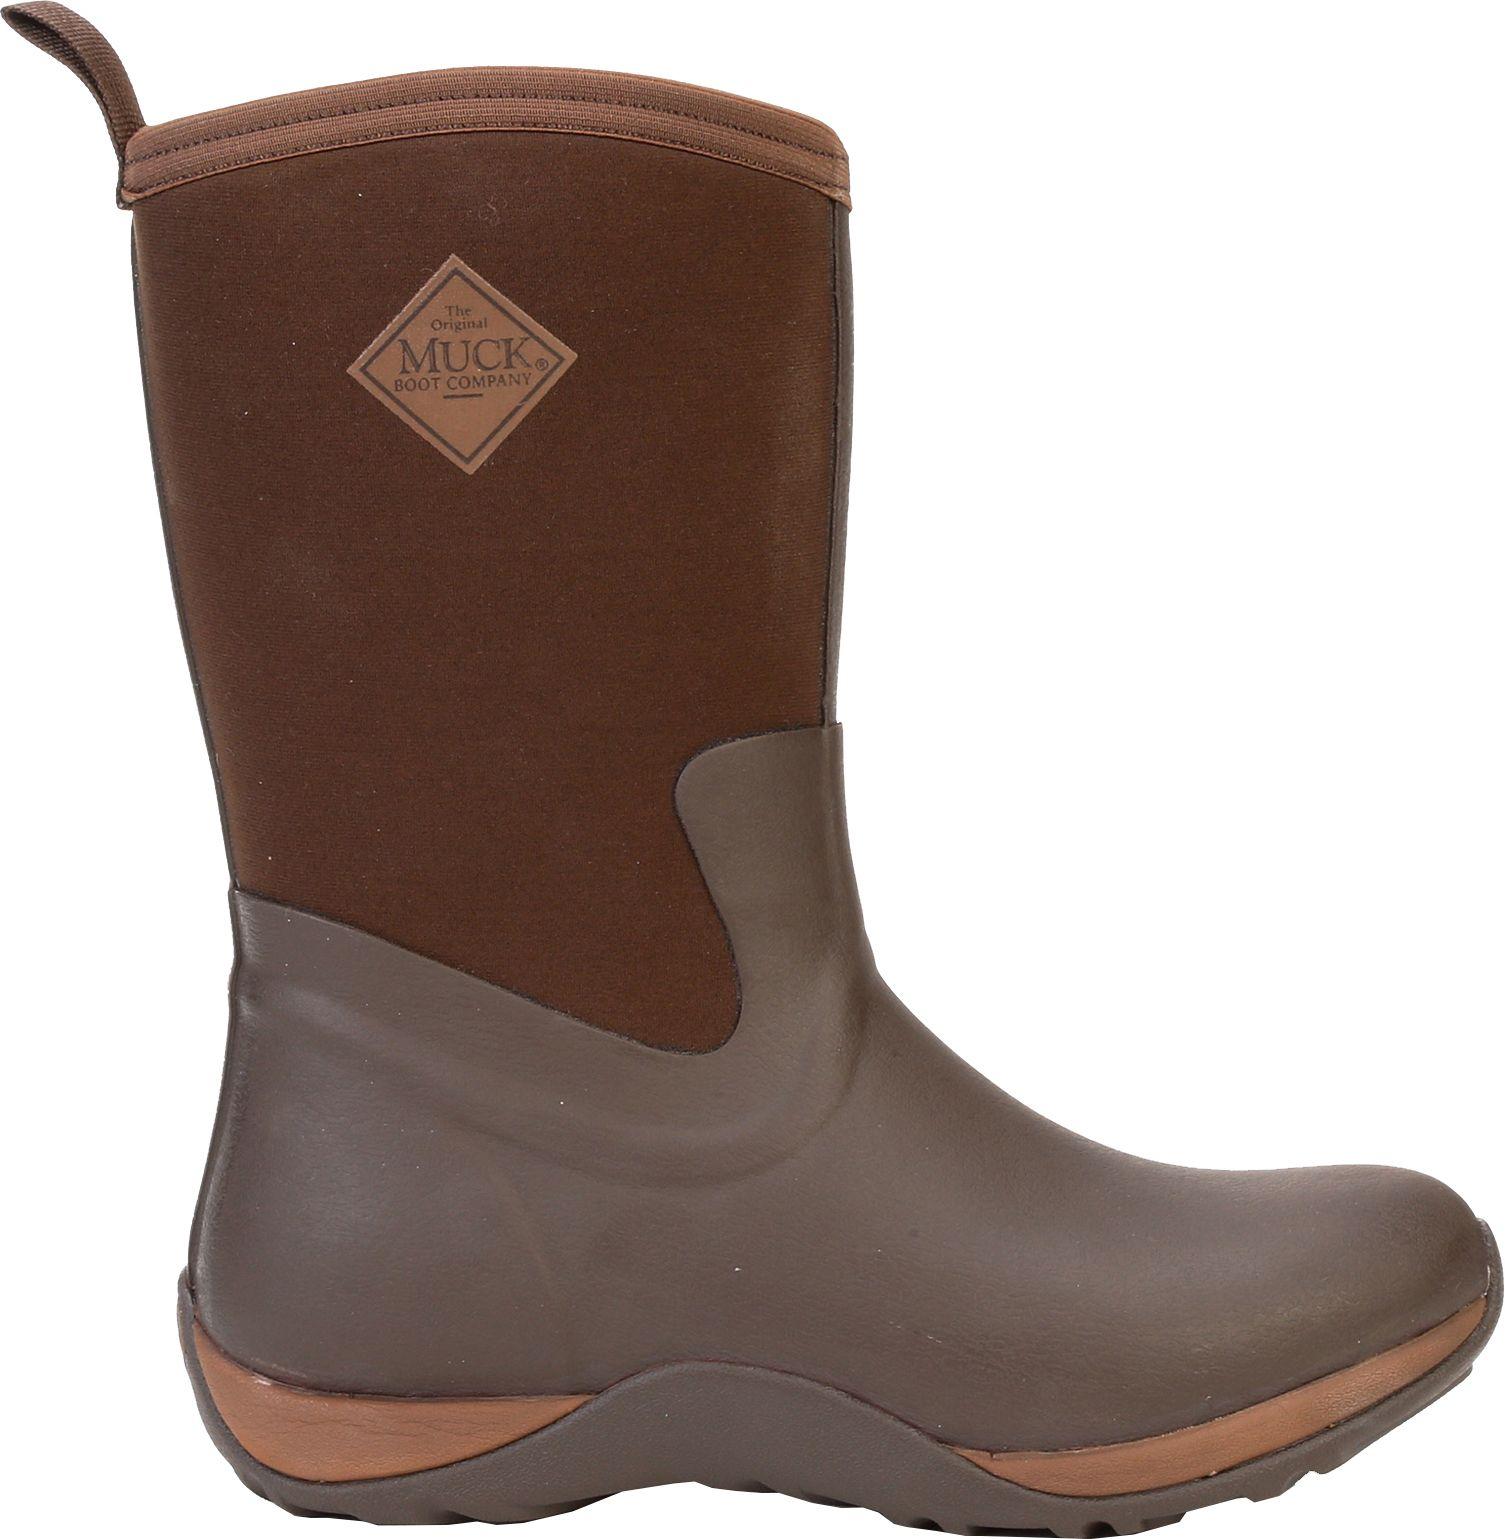 muck boots for women u0027s sporting goods